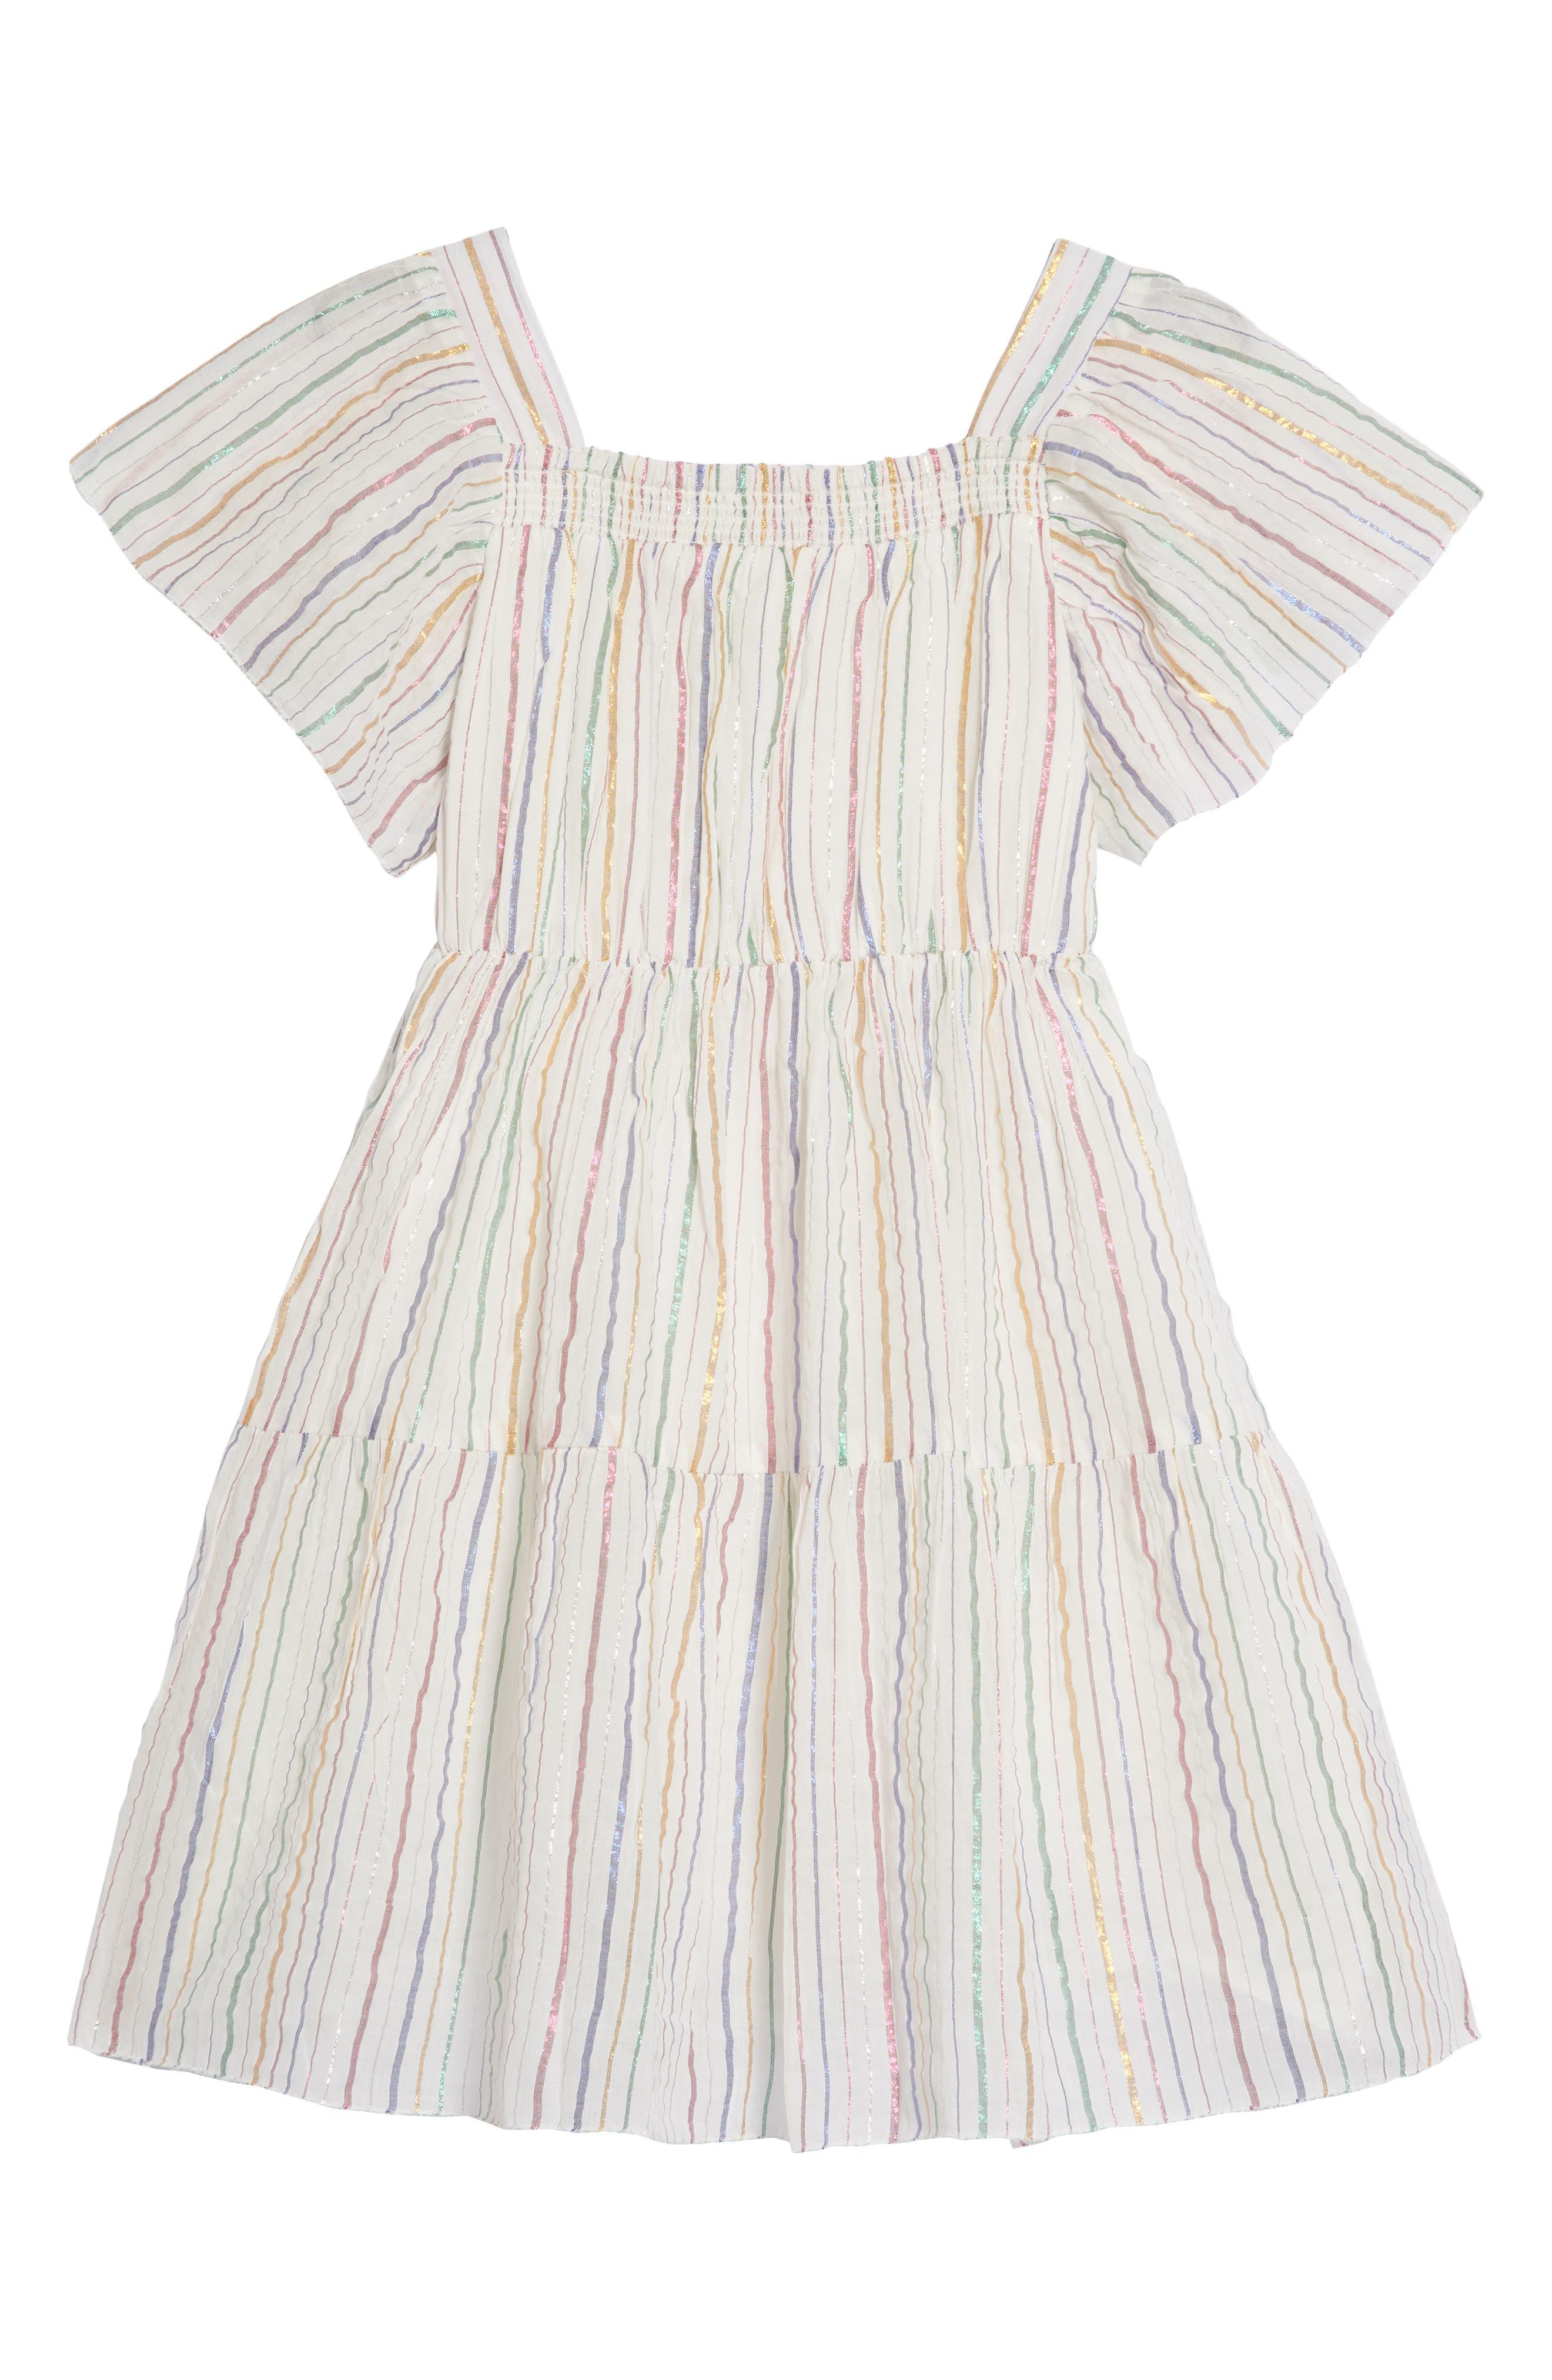 Sienna Dress,                             Alternate thumbnail 2, color,                             675